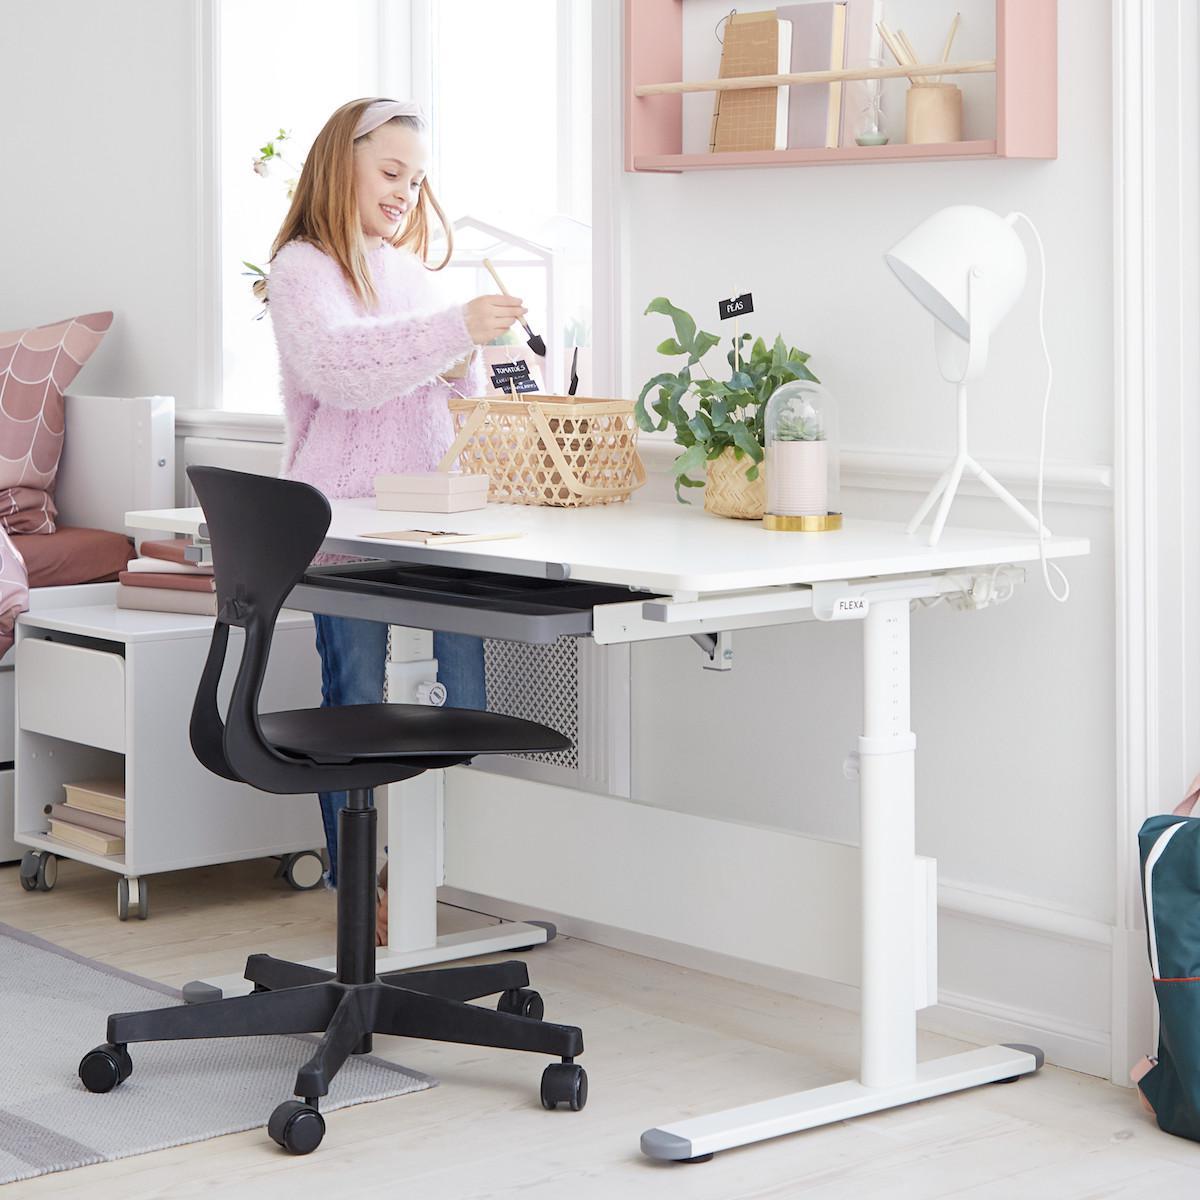 RAY by Flexa Chaise de bureau ergonomique bleue